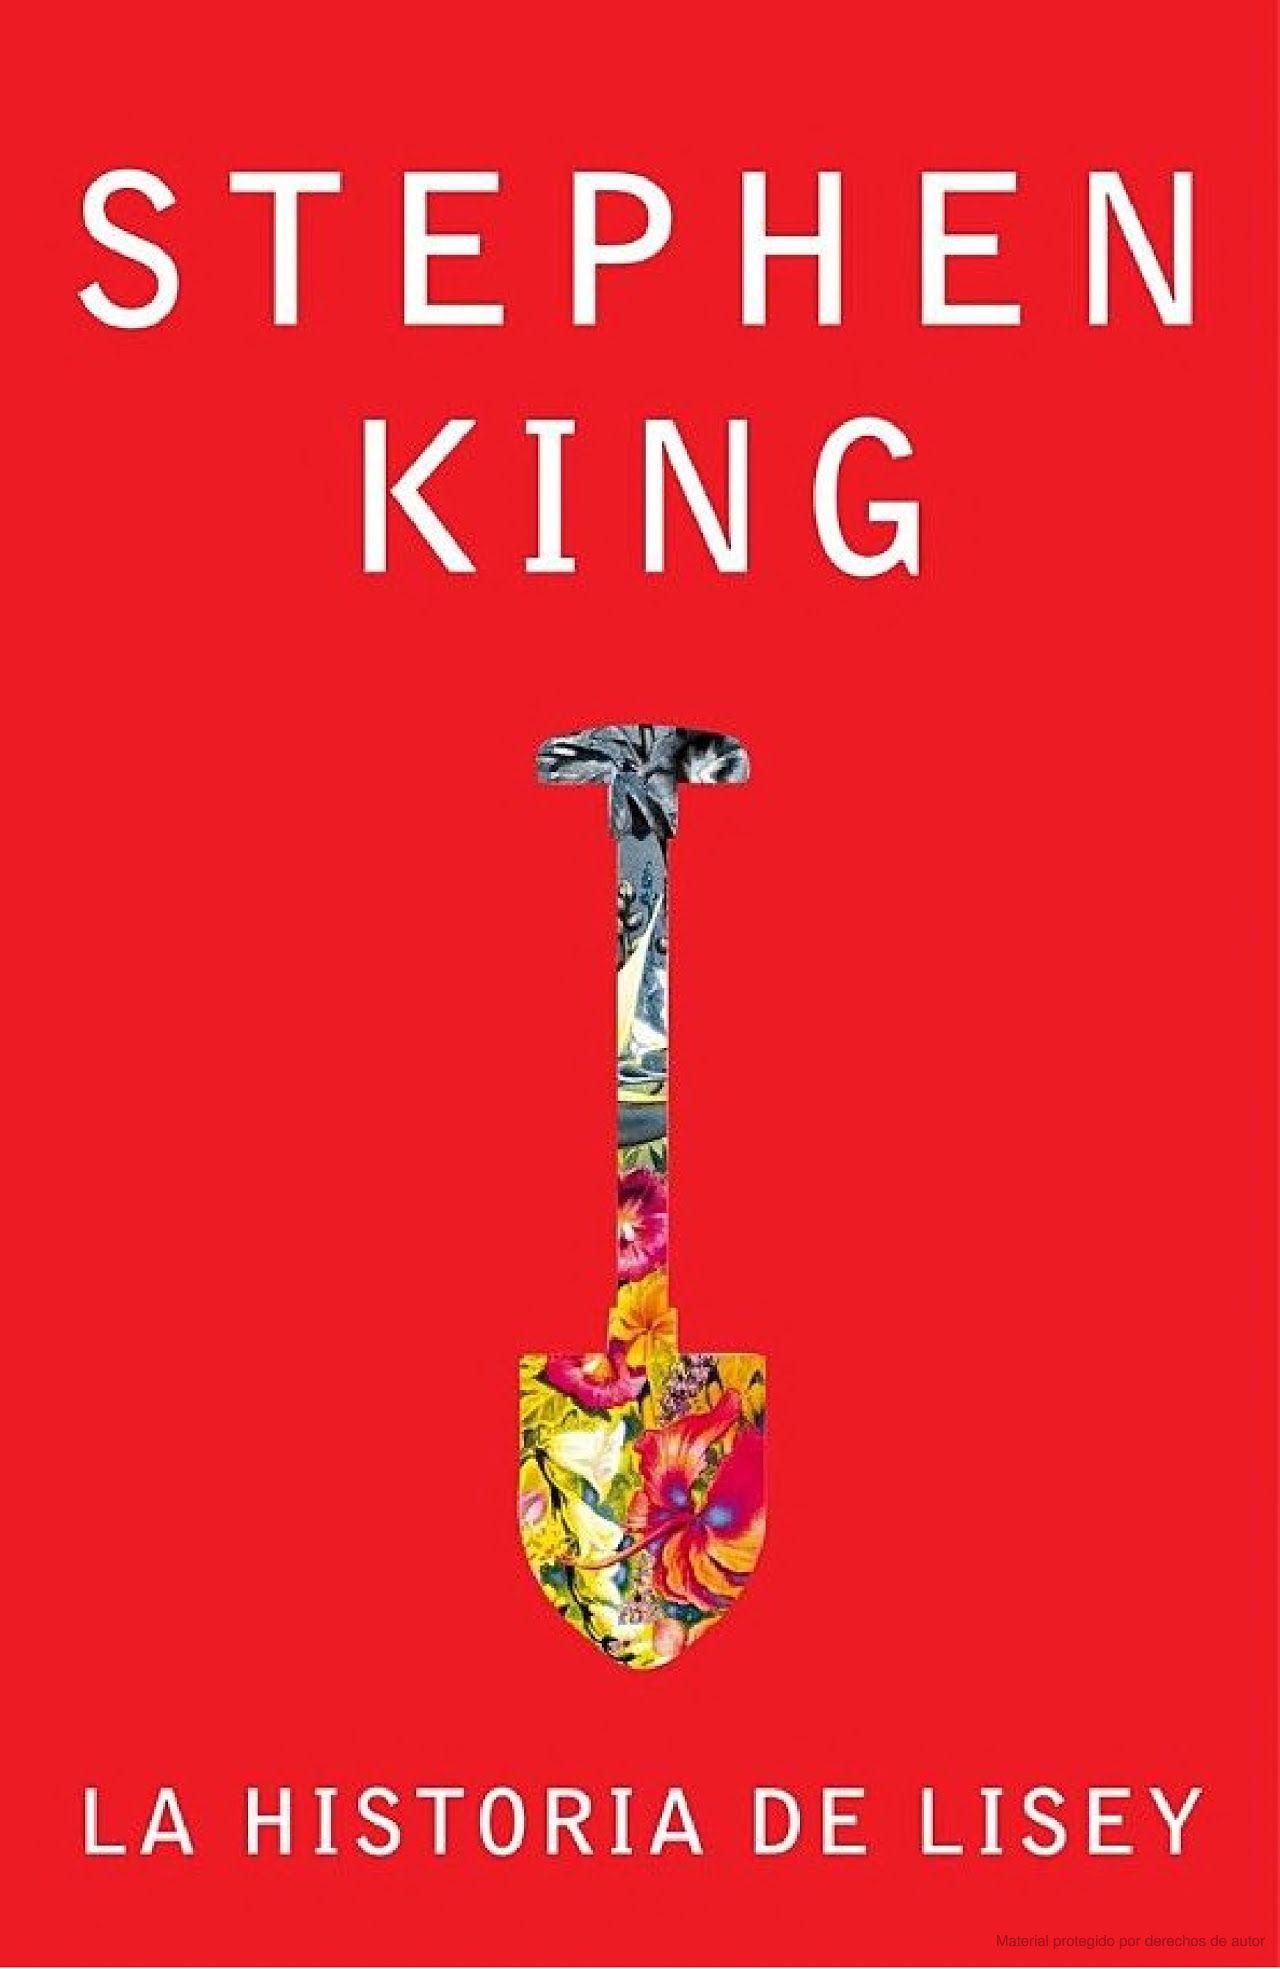 La Historia De Lisey Stephen King Google Libros Stephen King Stephen King It Libros En Línea